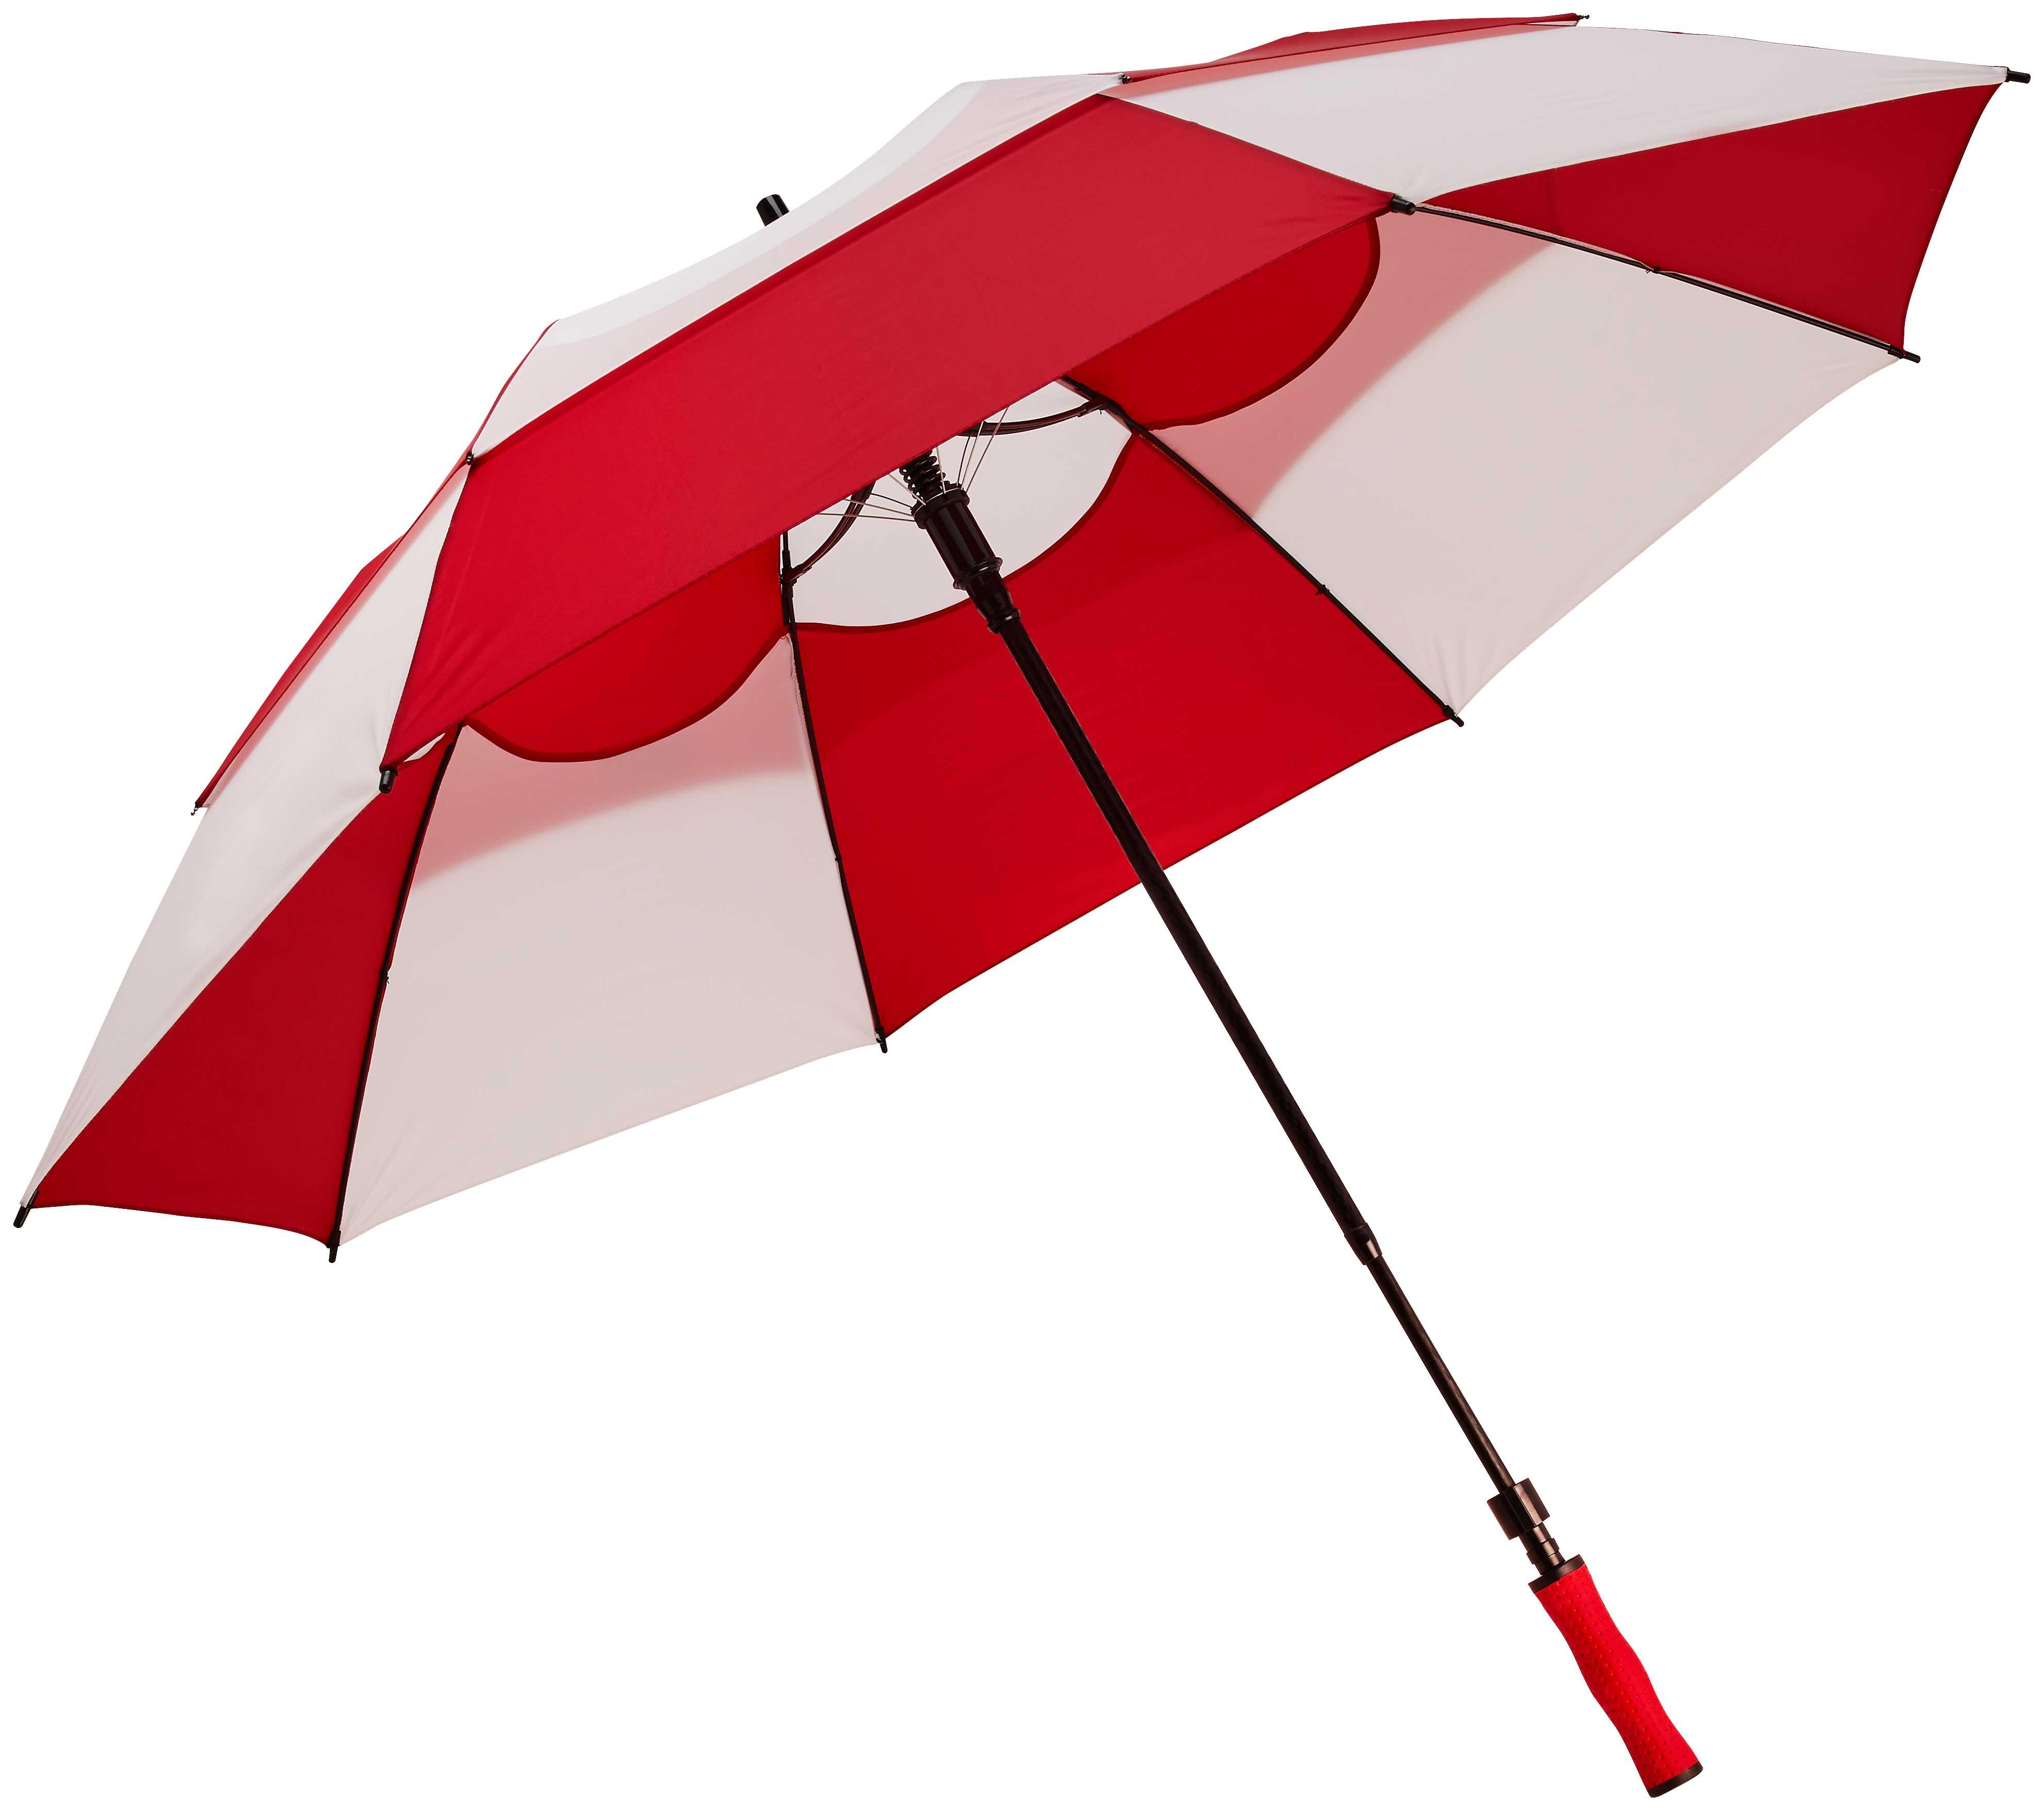 3966x3513 Wind Vent Umbrella